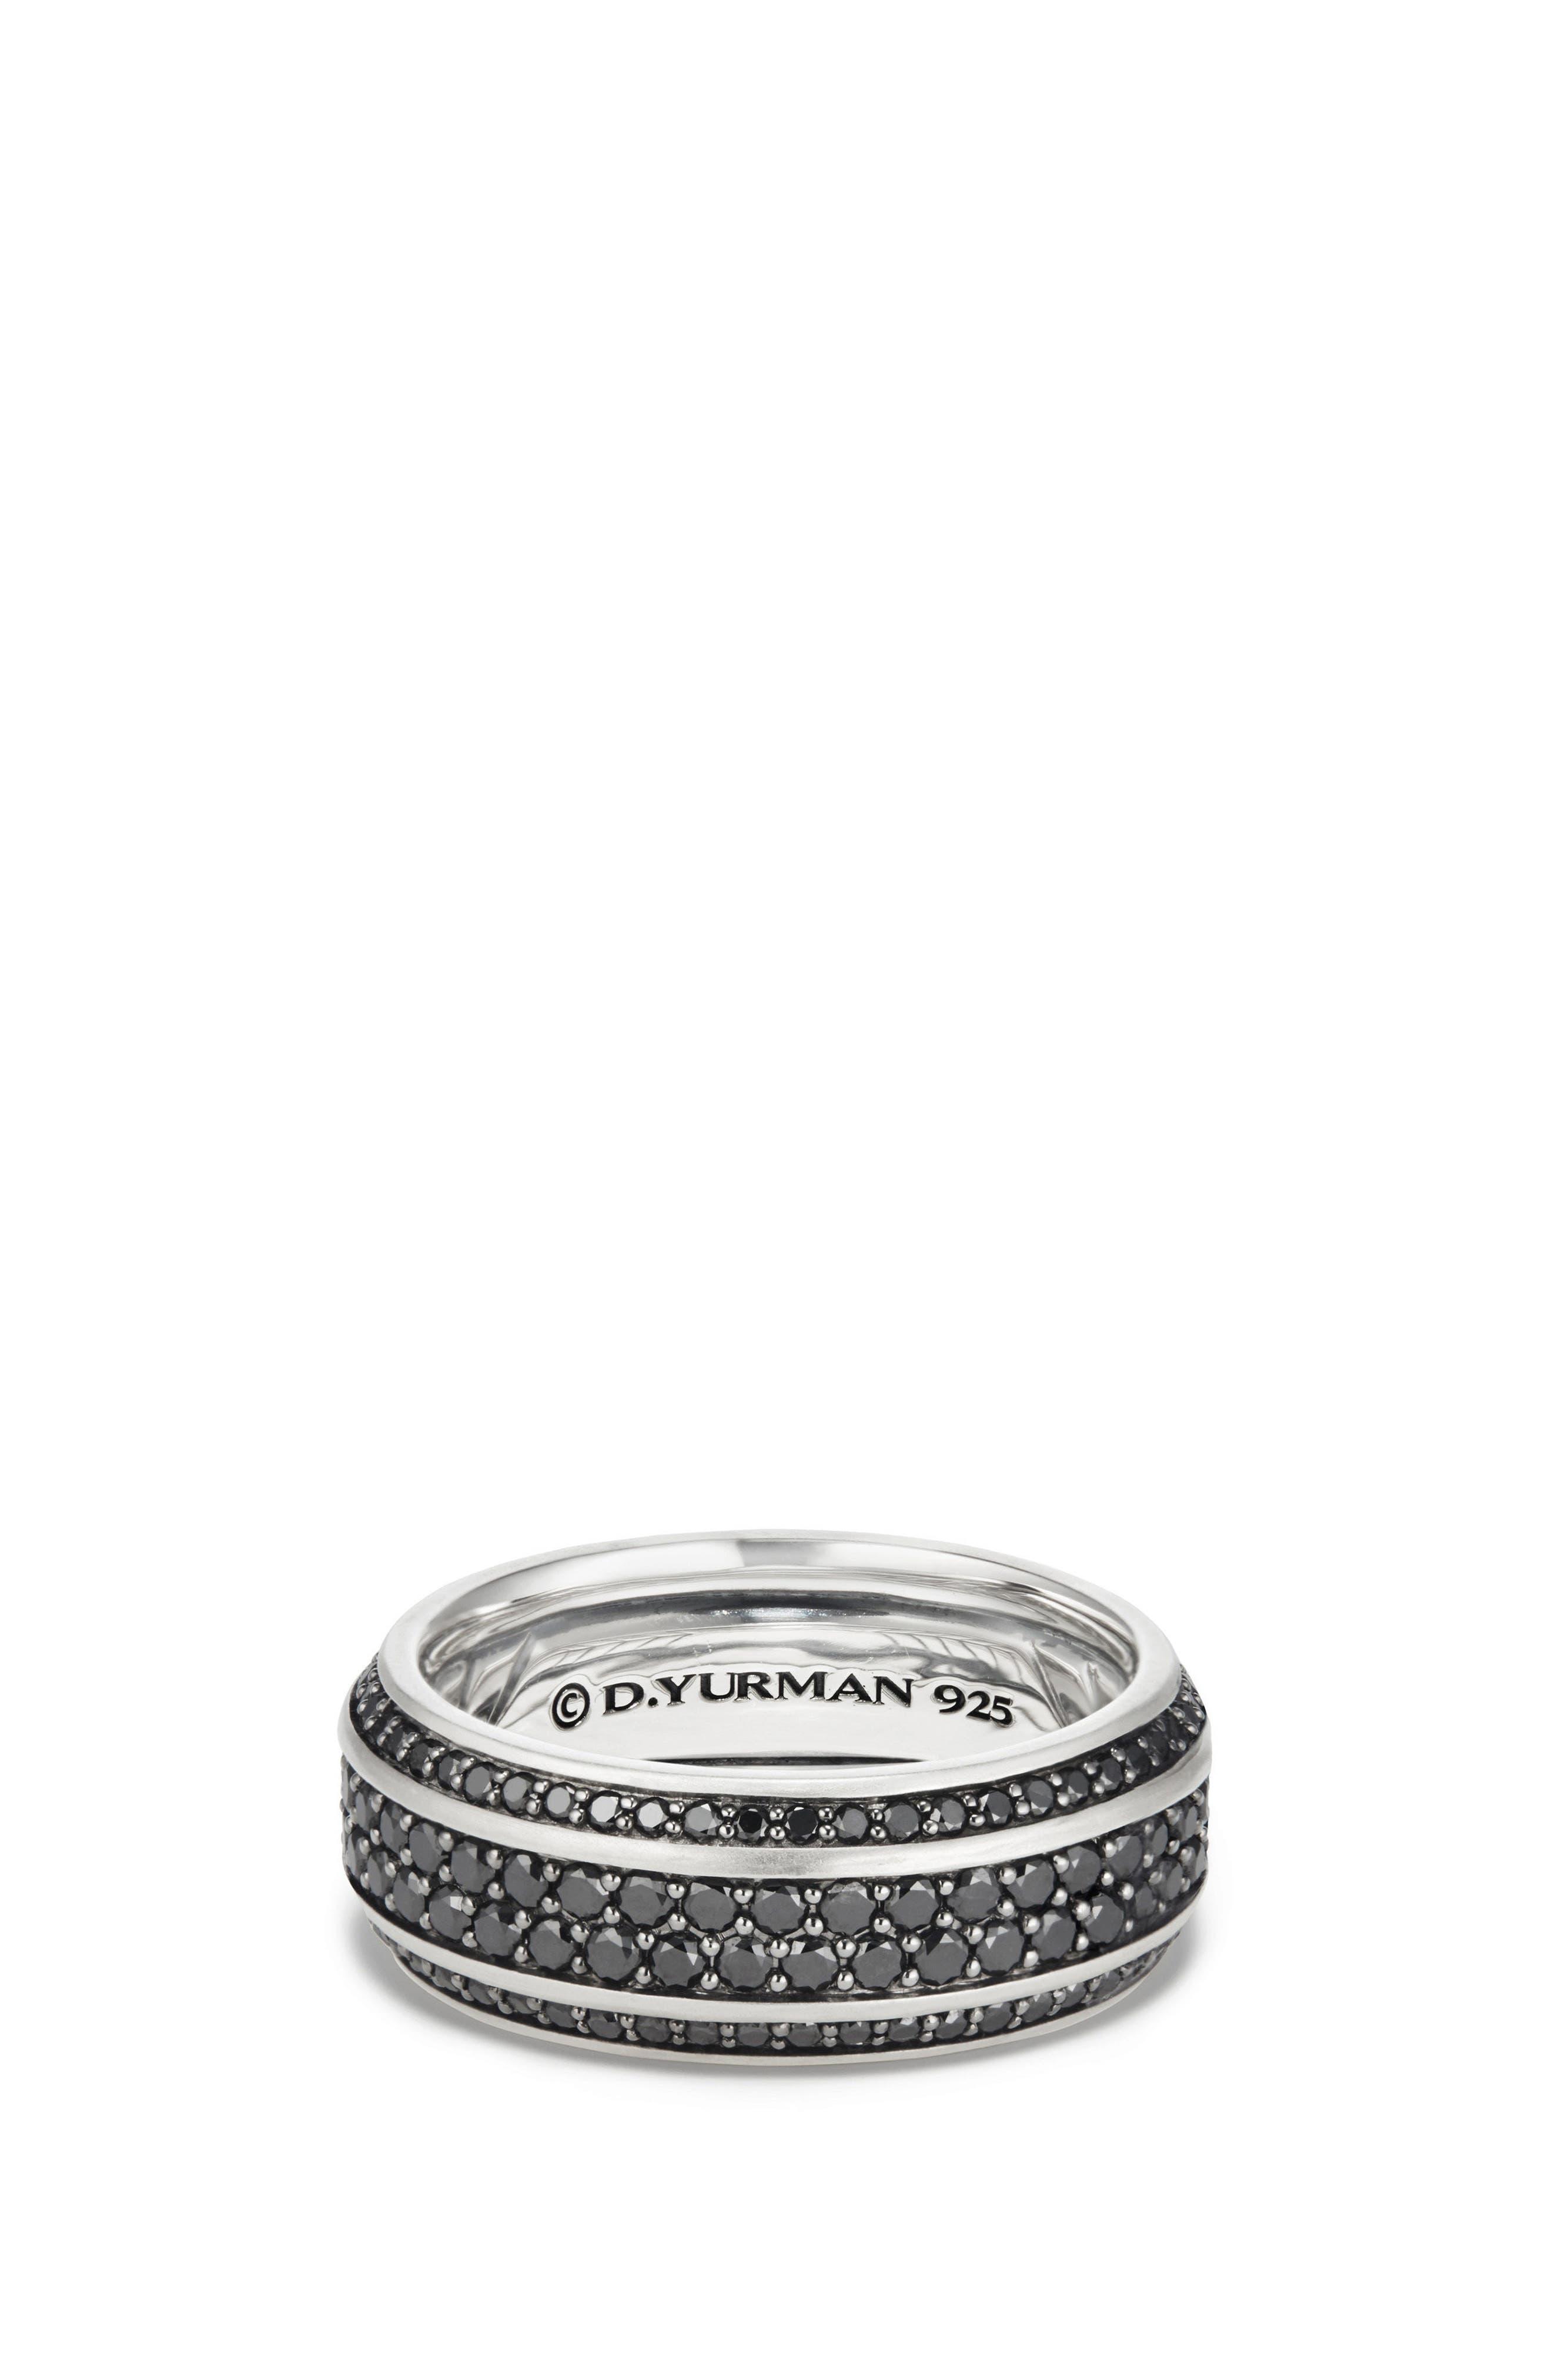 Streamline Beveled Edge Band Ring,                         Main,                         color, BLACK DIAMOND